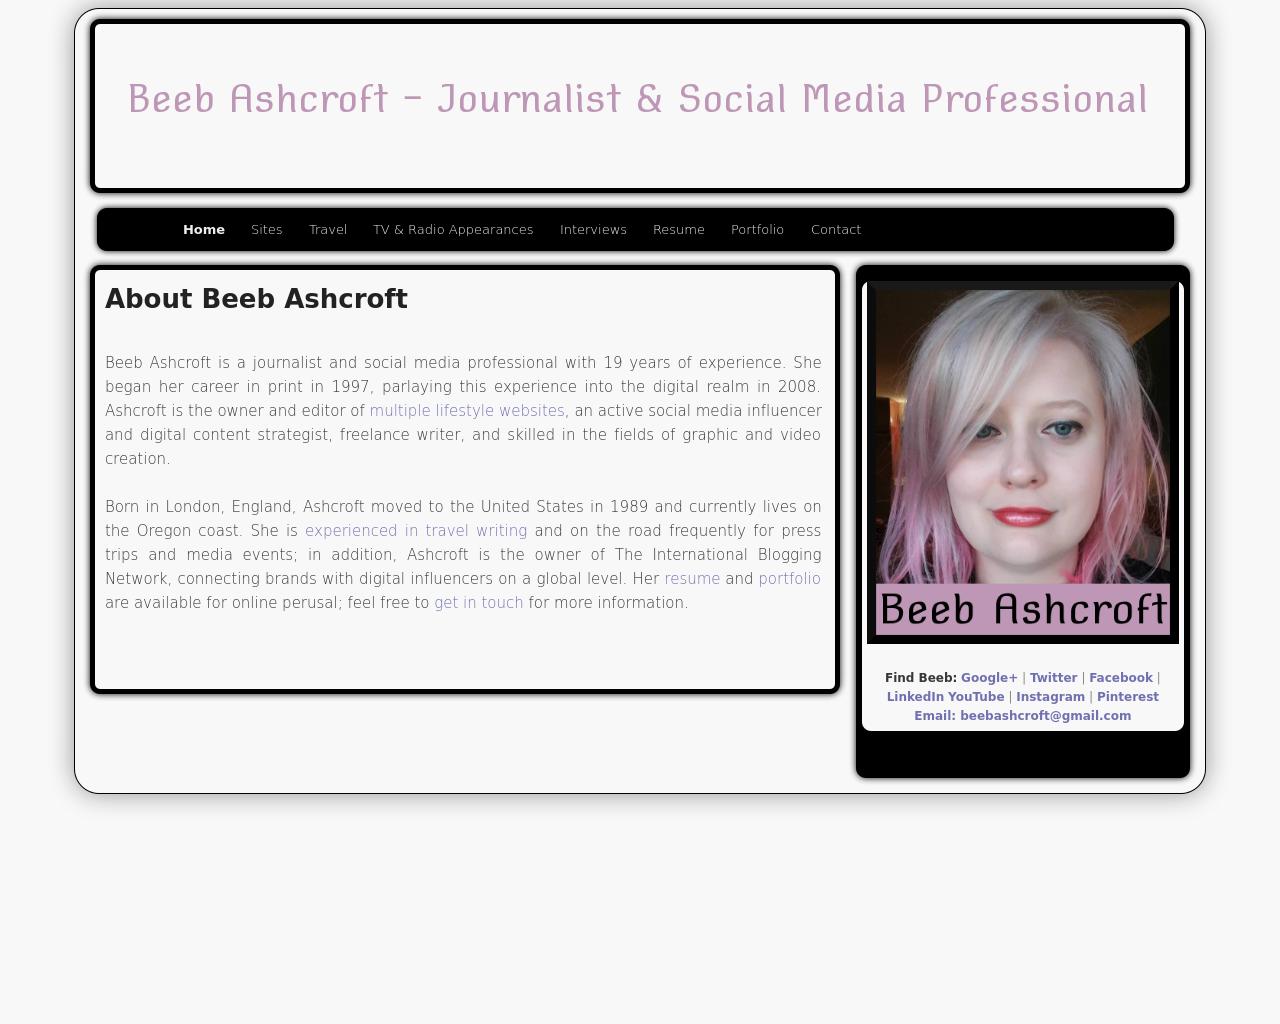 Beeb-Ashcroft-Advertising-Reviews-Pricing